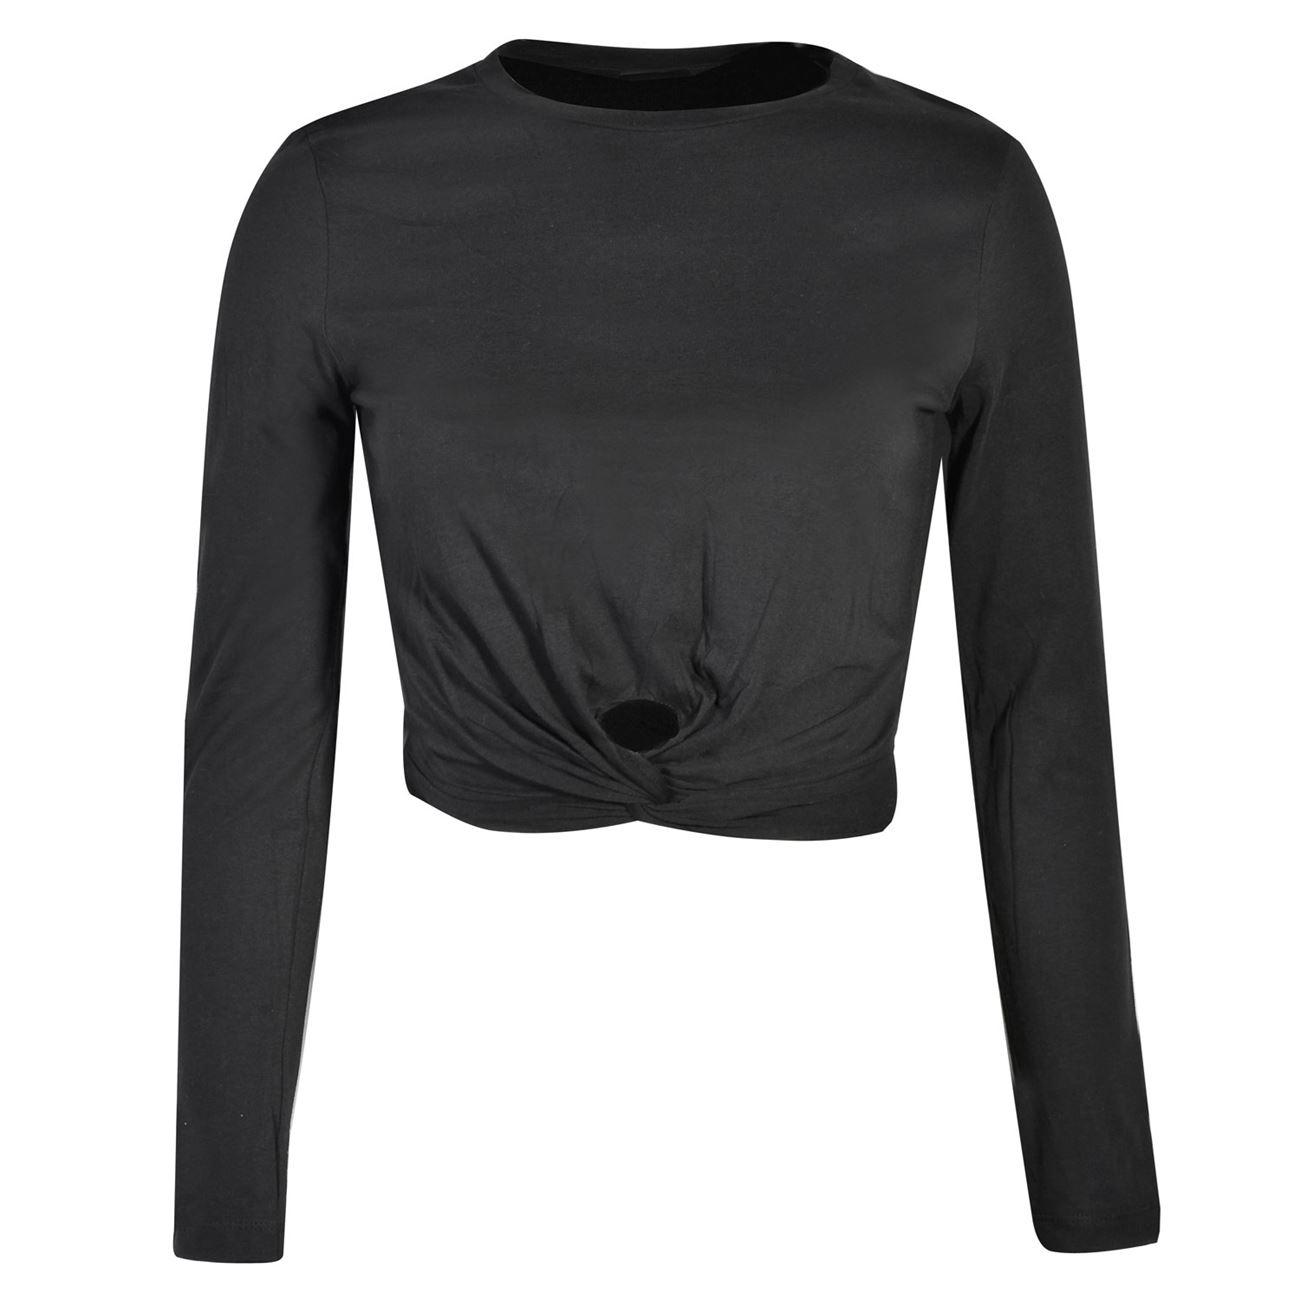 02837b477302 Μπλούζα Μακρυμάνικη Γυναικεία Crop Top Μαύρη Κόμπος - One Size   Μπλούζες  Μακρυμάνικές